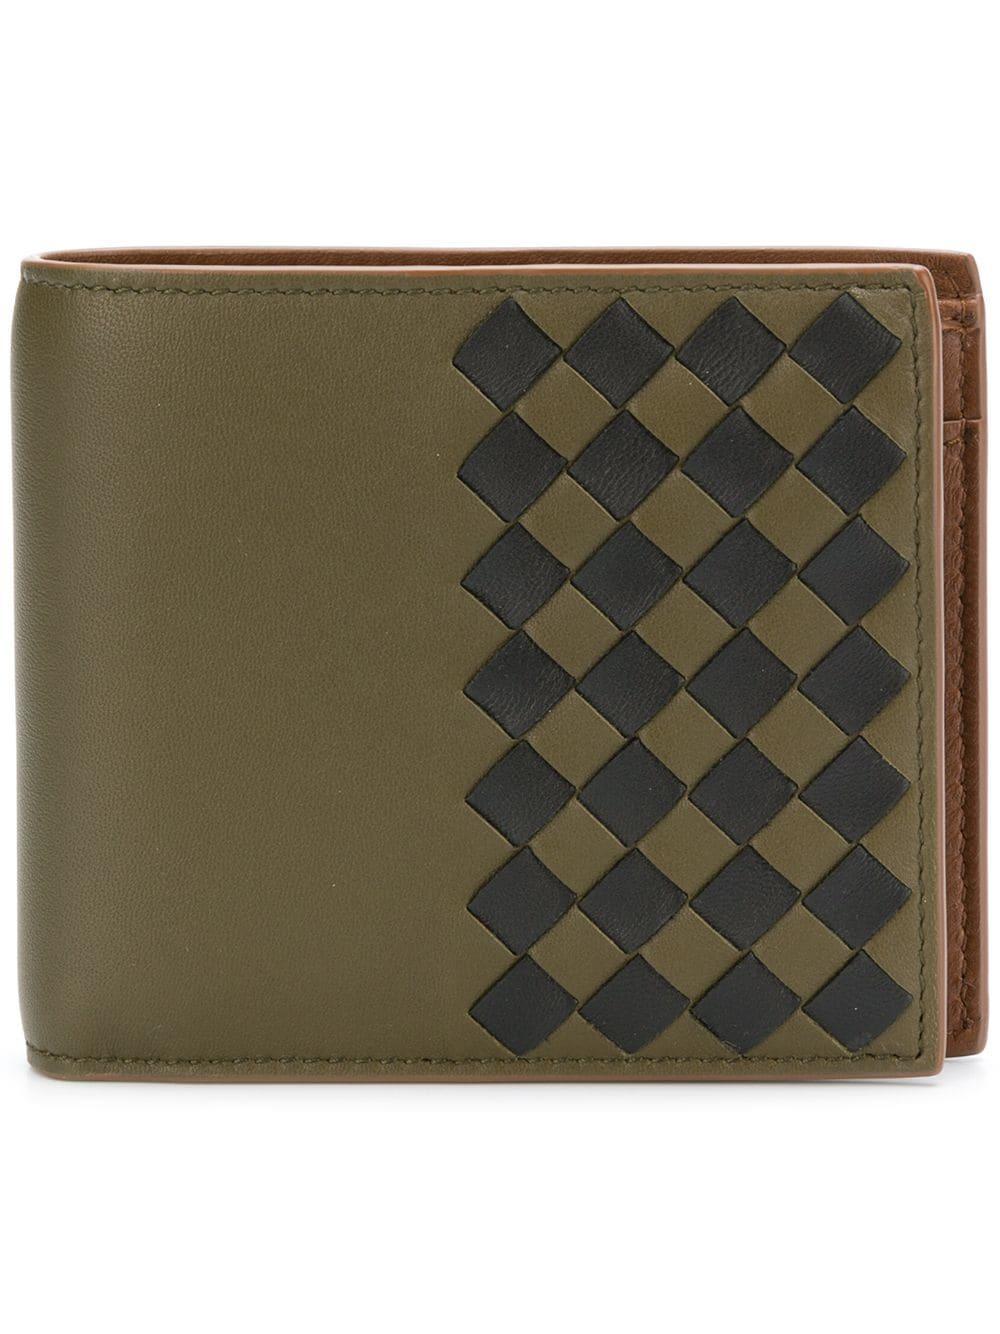 fdc664e7e2df Bottega Veneta Intecciato Check Bifold Wallet In Green